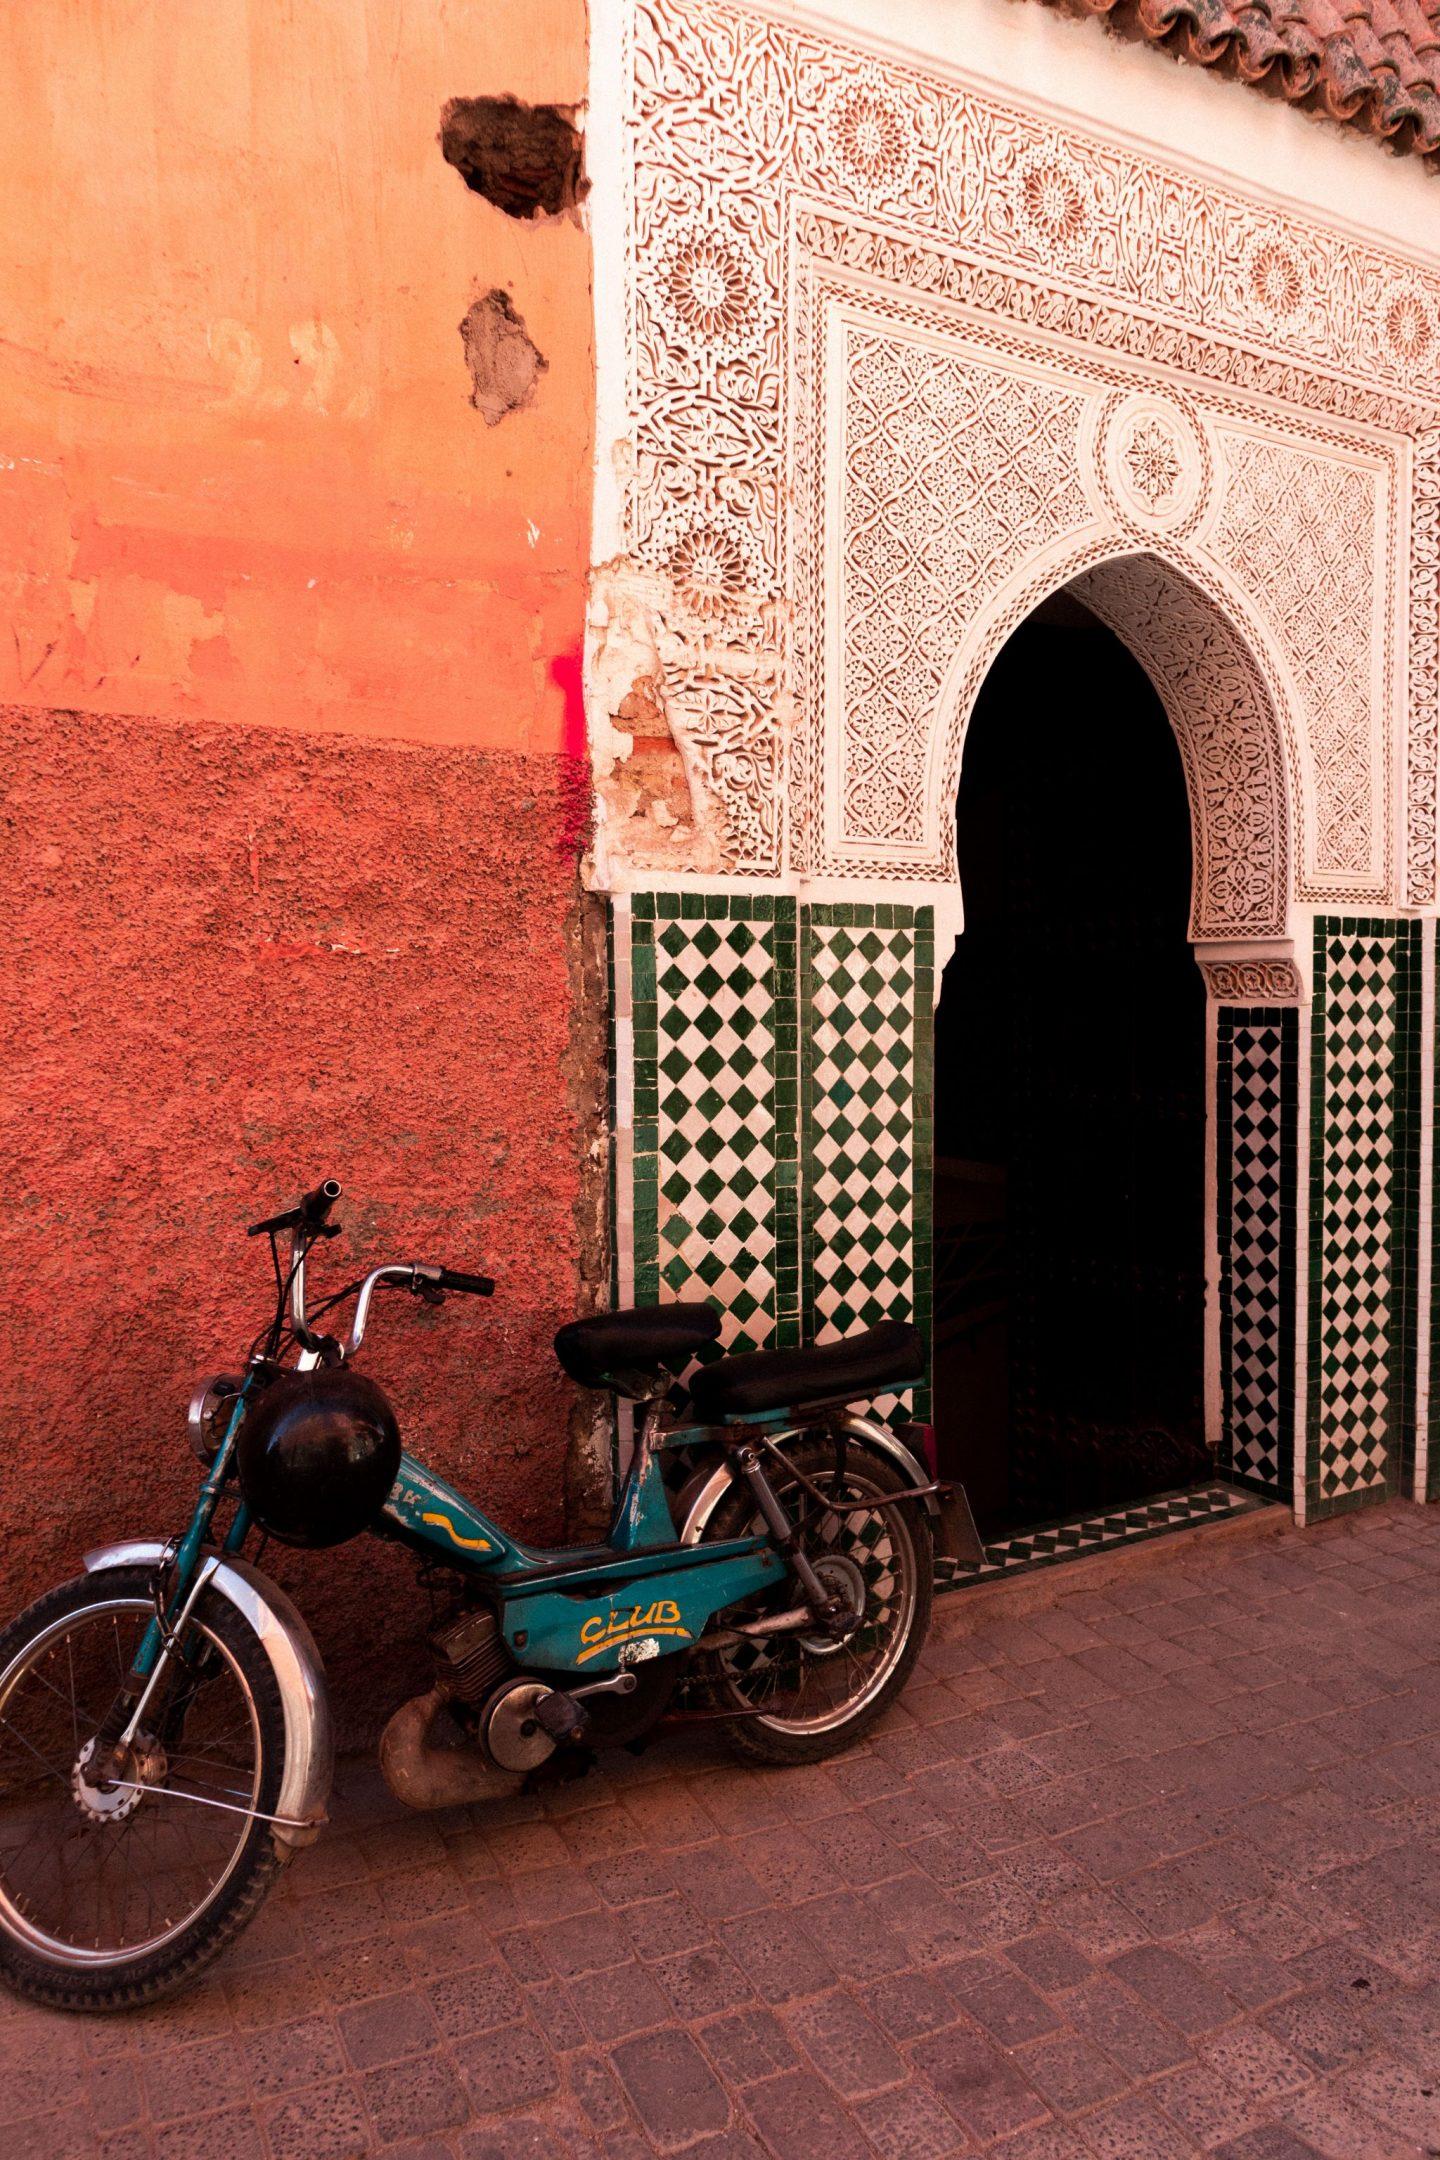 Motorbike parked by a Door in Marrakesh